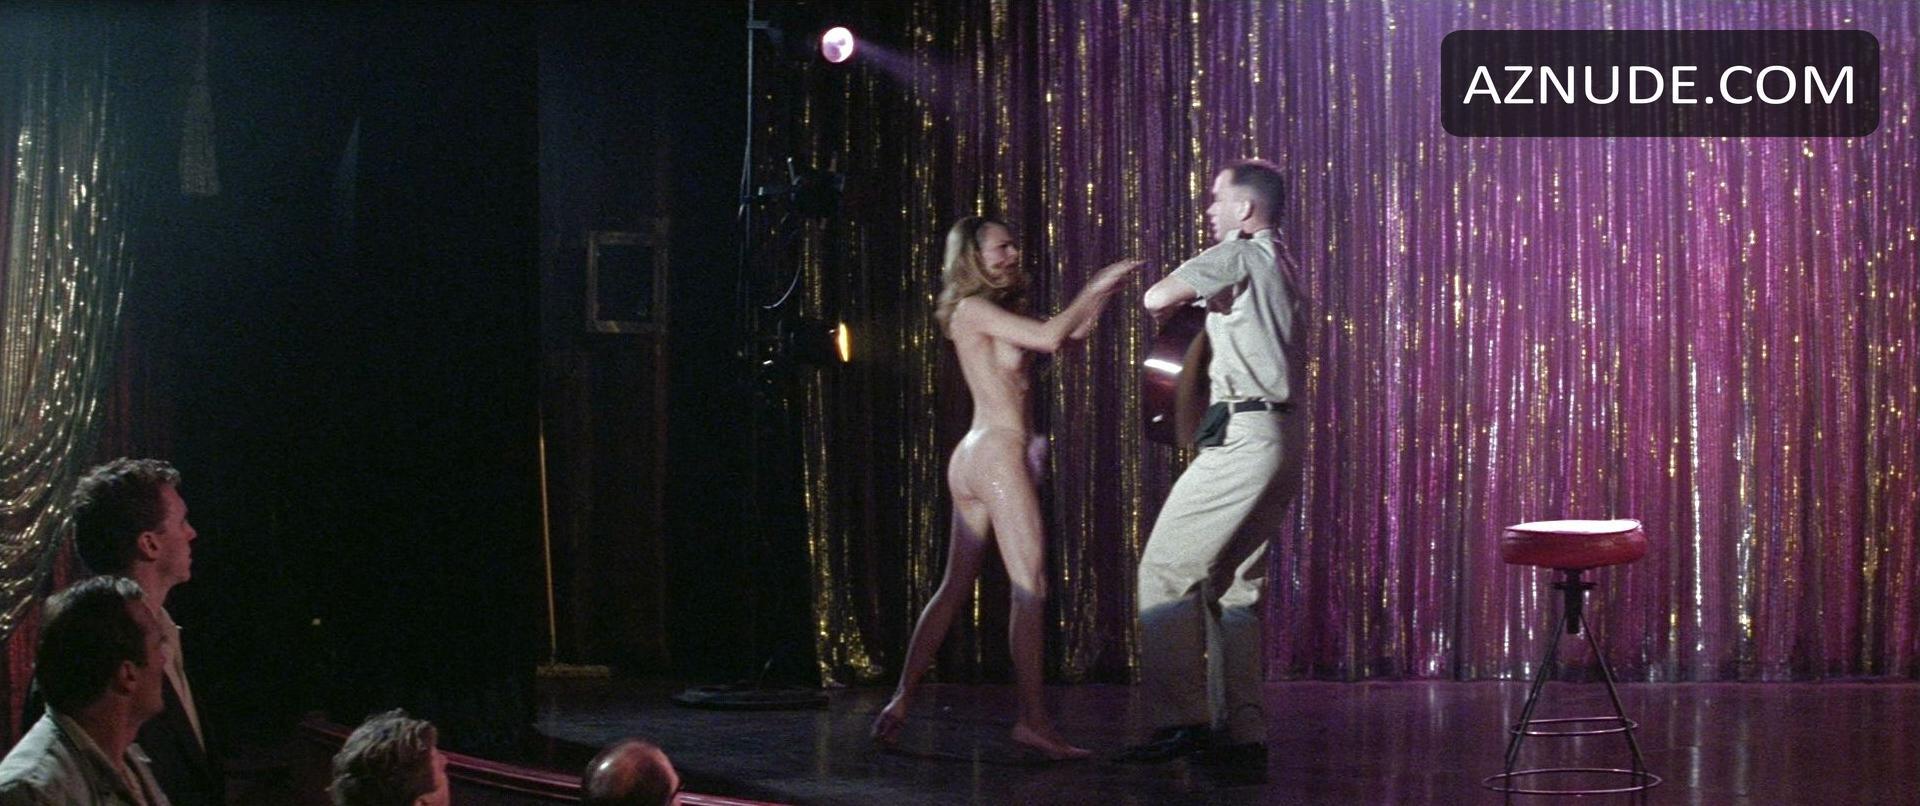 sexy gerls naked man